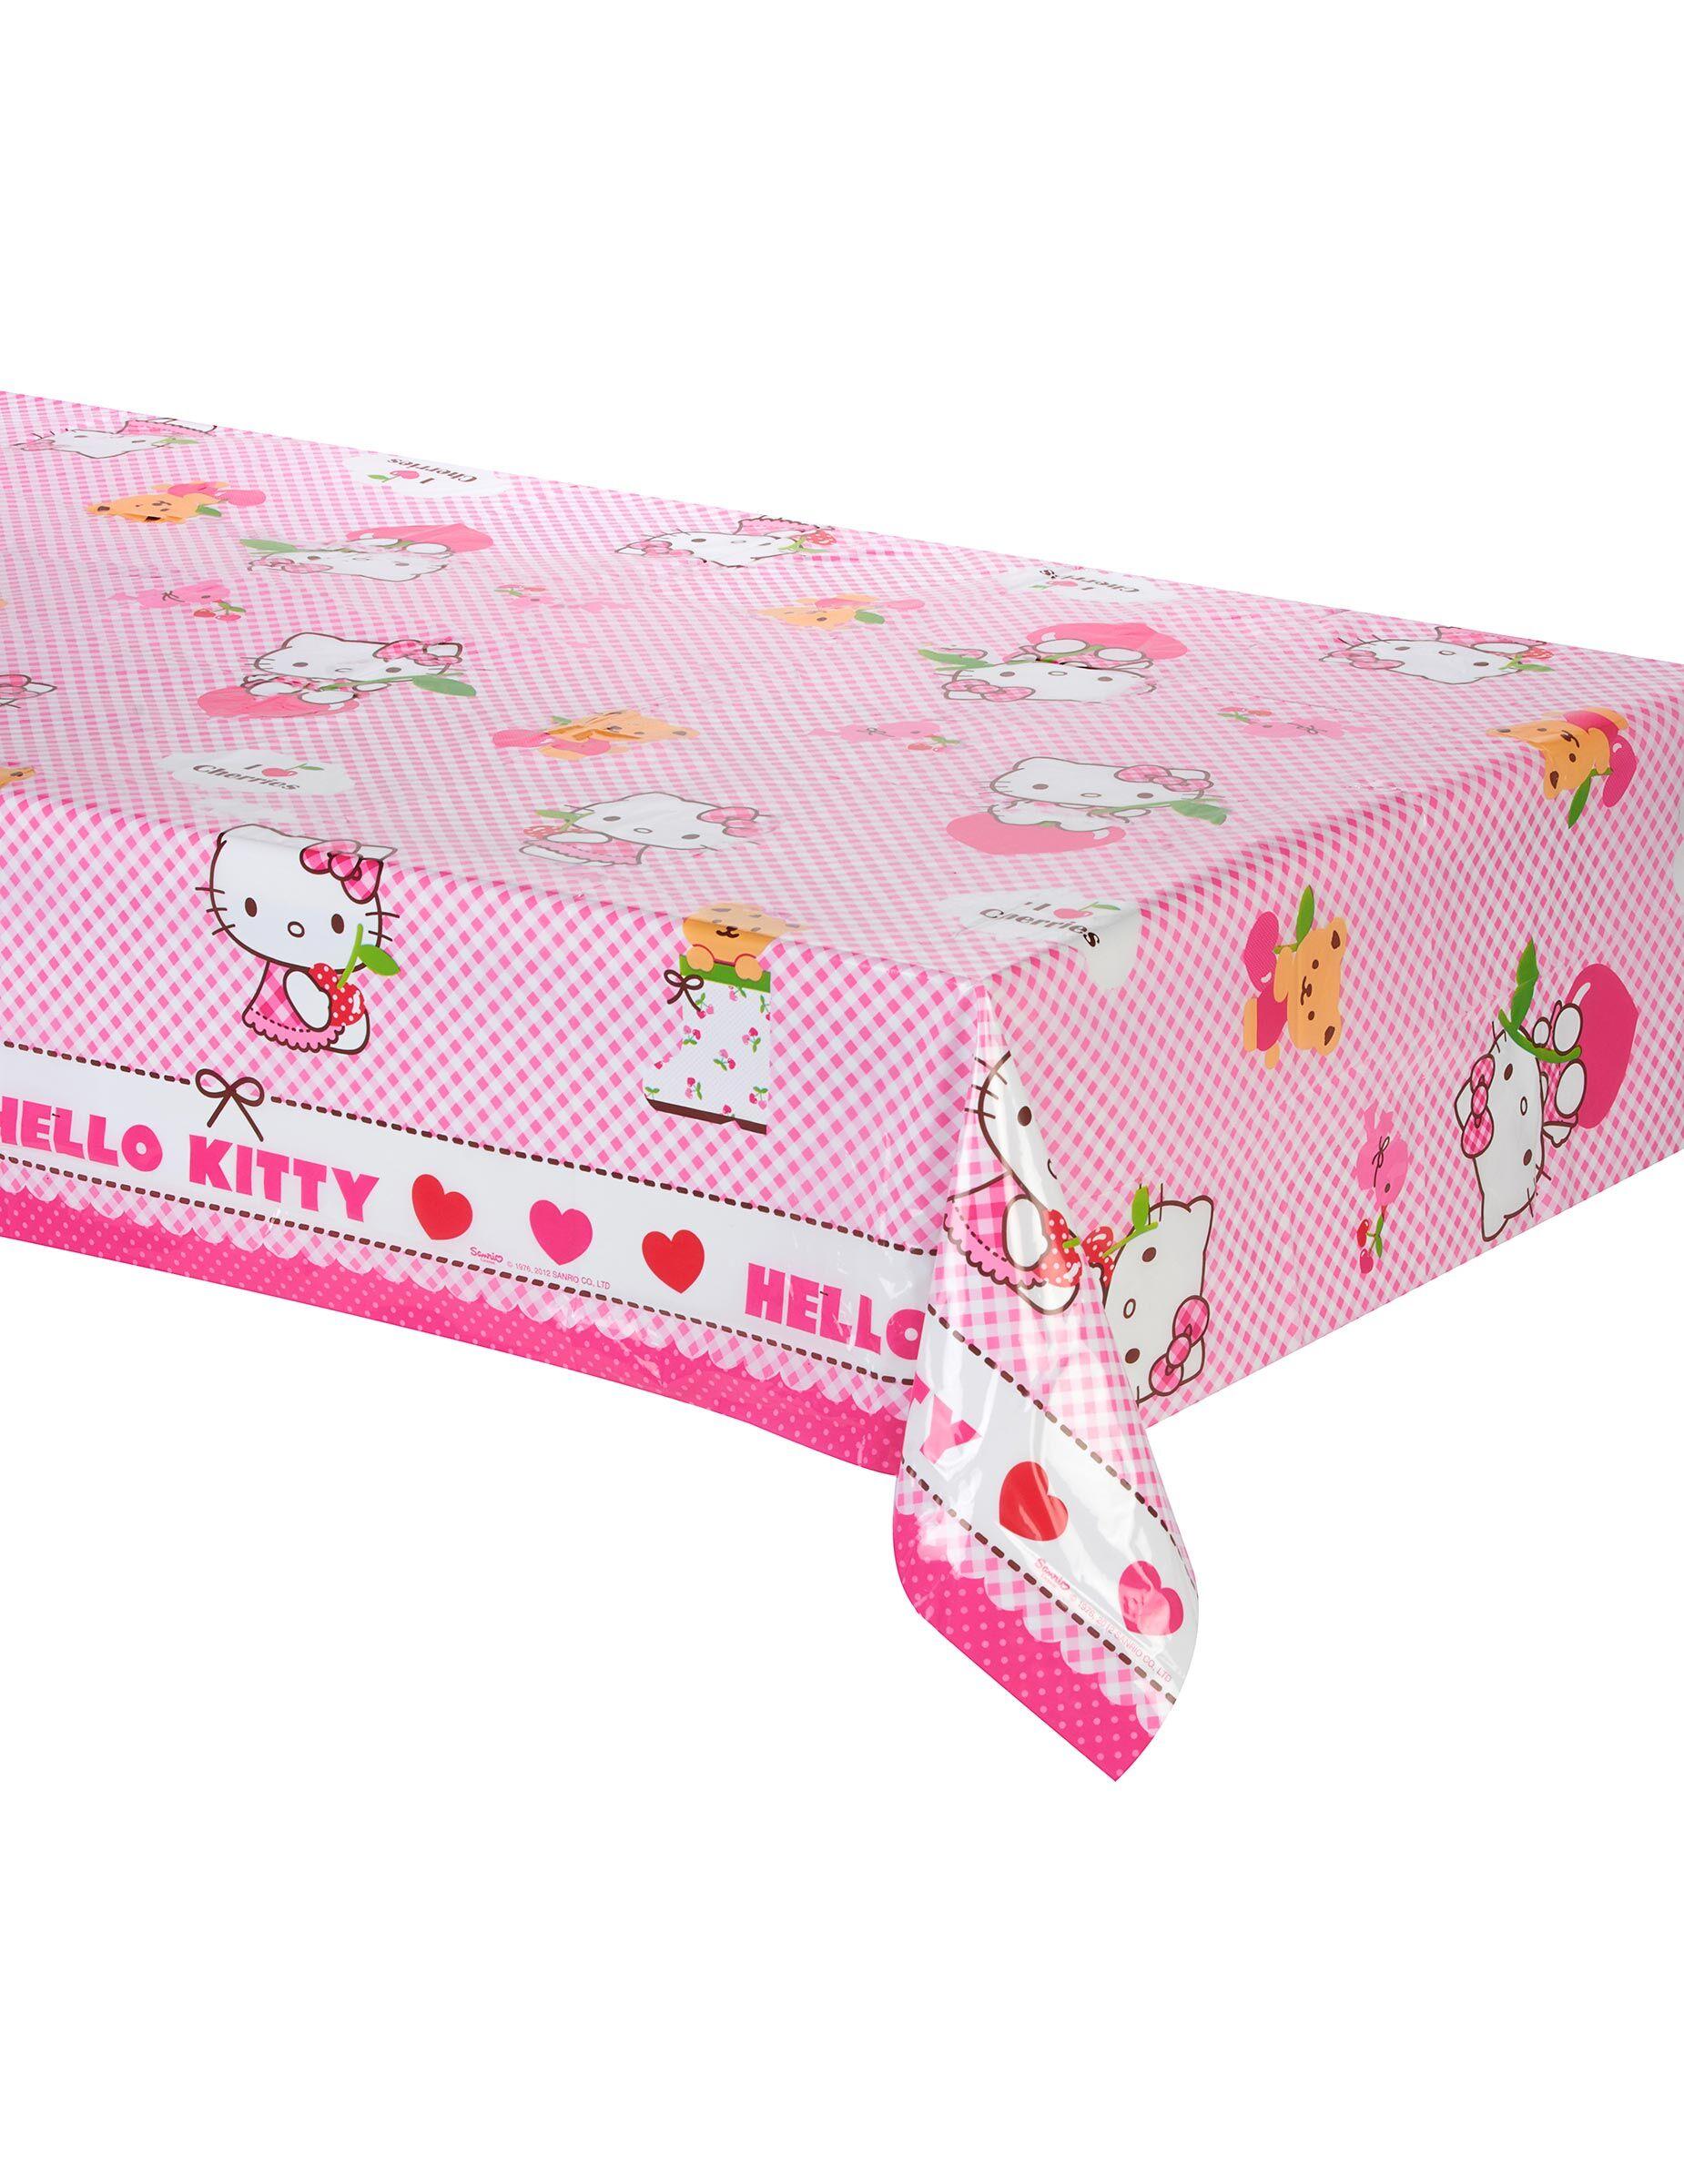 Deguisetoi Nappe en plastique Hello Kitty 120 x 180 cm